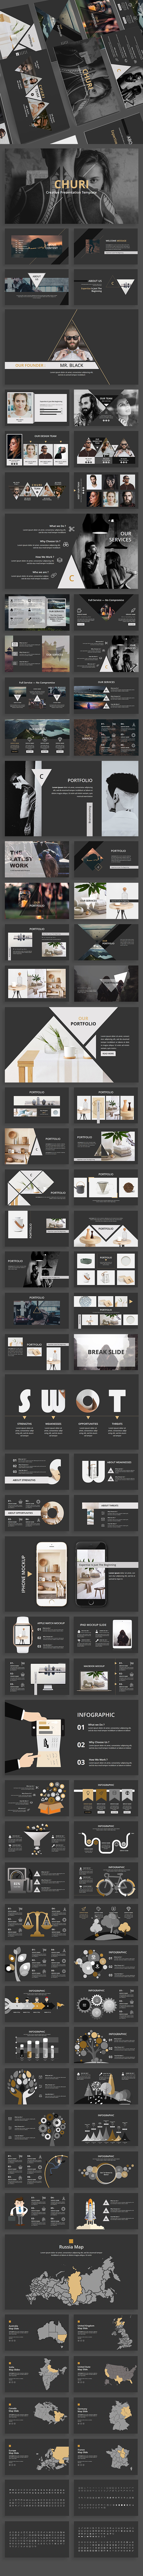 Churi Creative Google Slide Template - Google Slides Presentation Templates